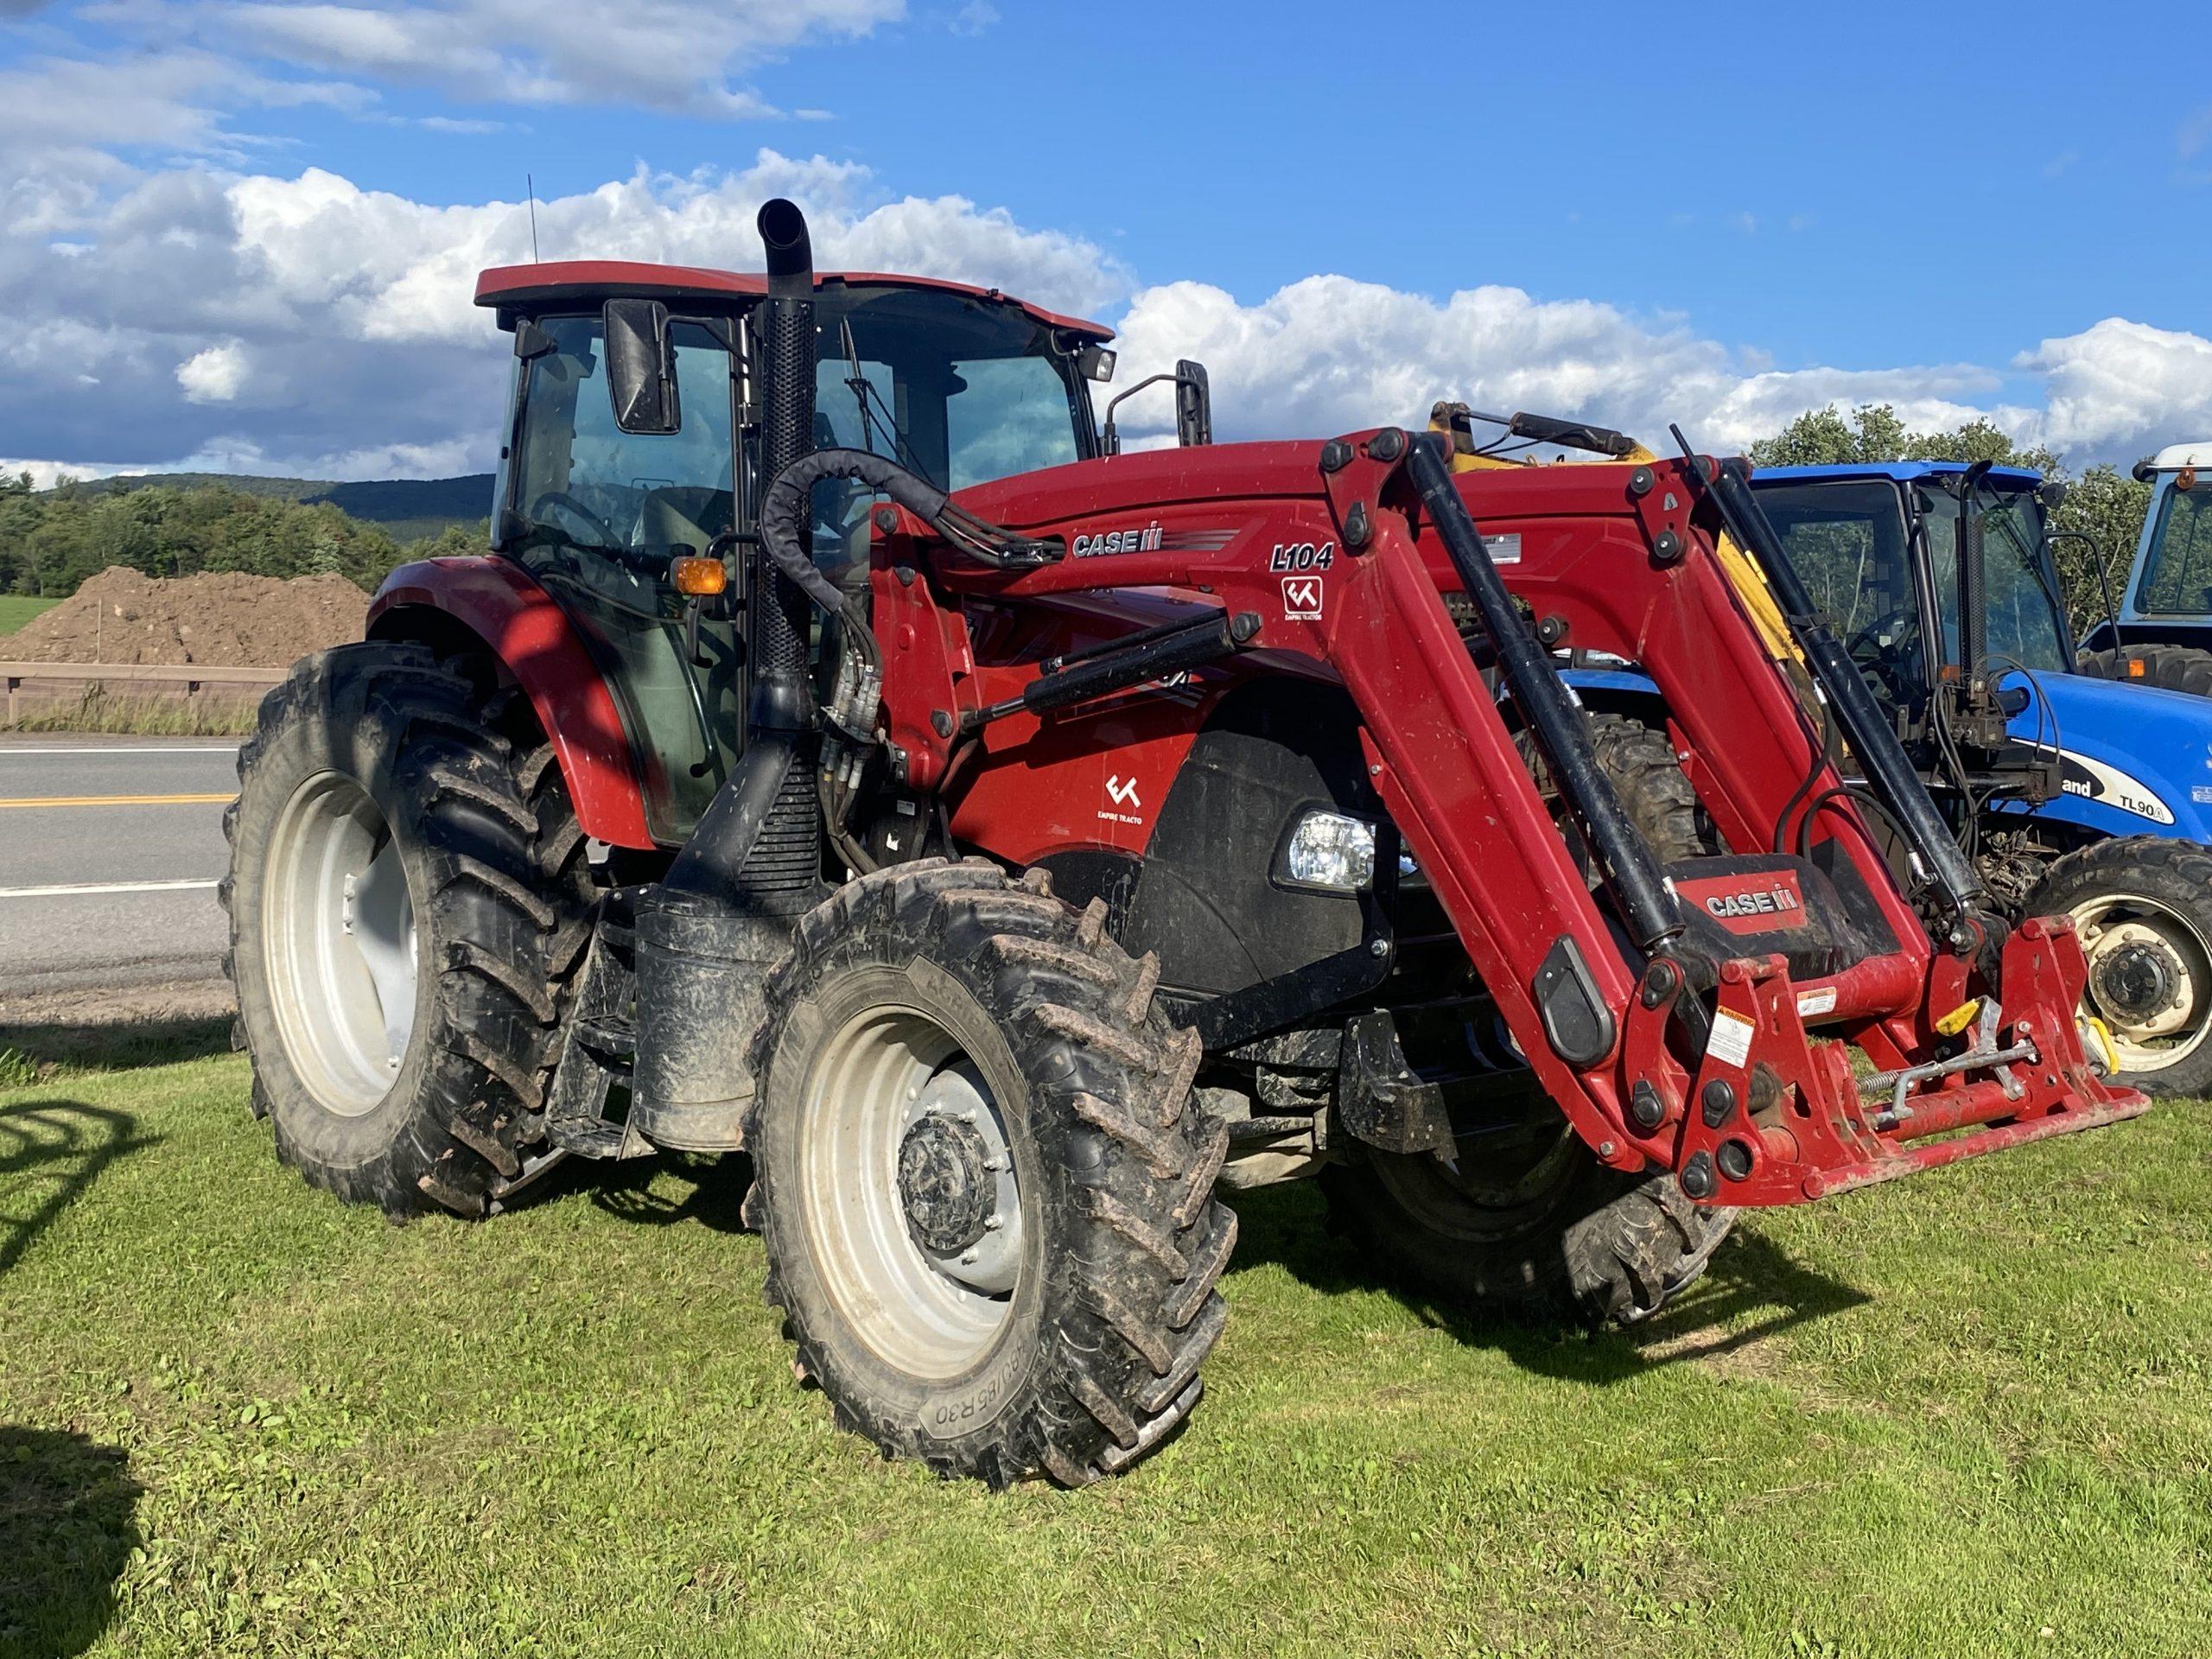 Eklund Farm Machinery Fall Used Equipment + Consignment Auction